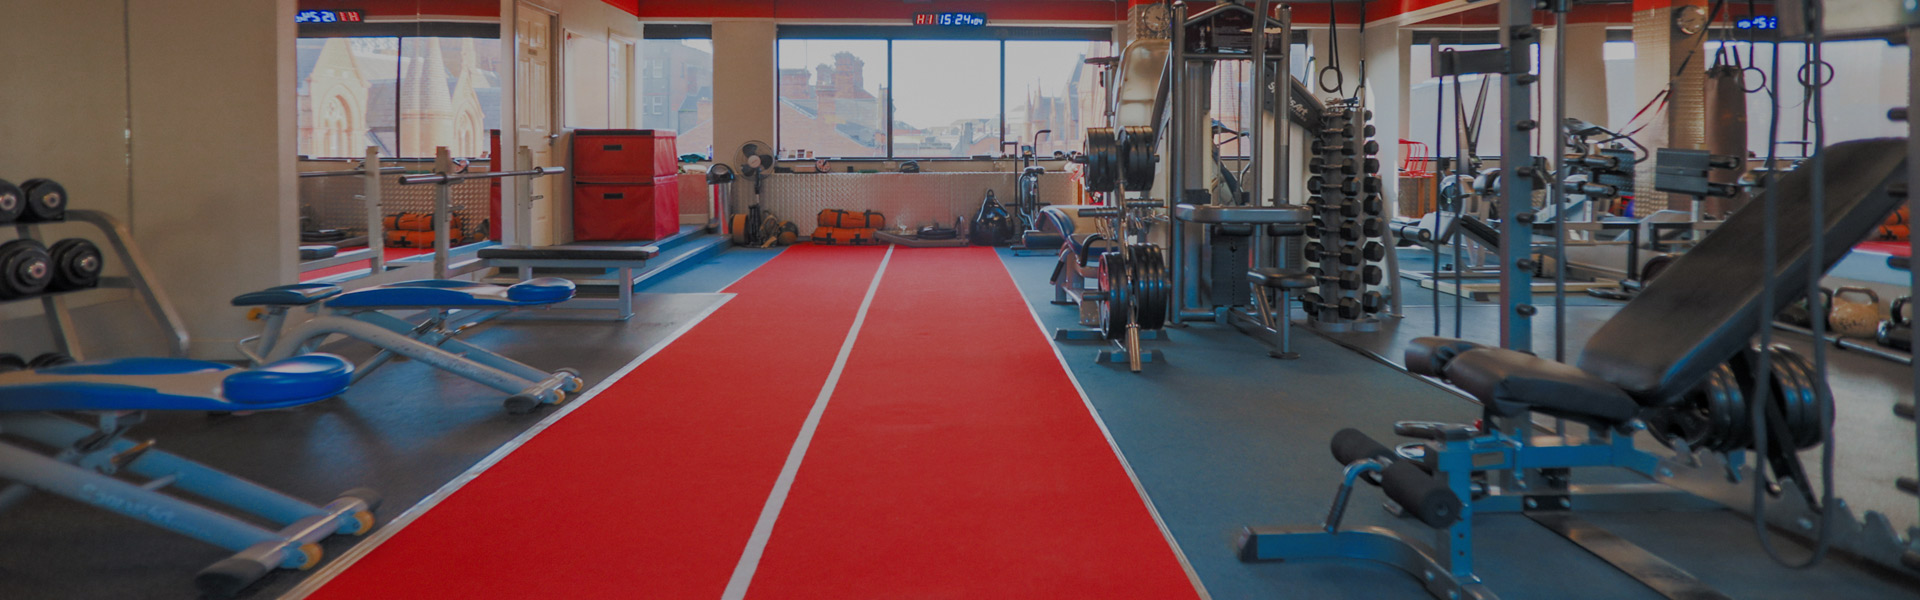 metabollic-fitness-personal-trainer-dublin